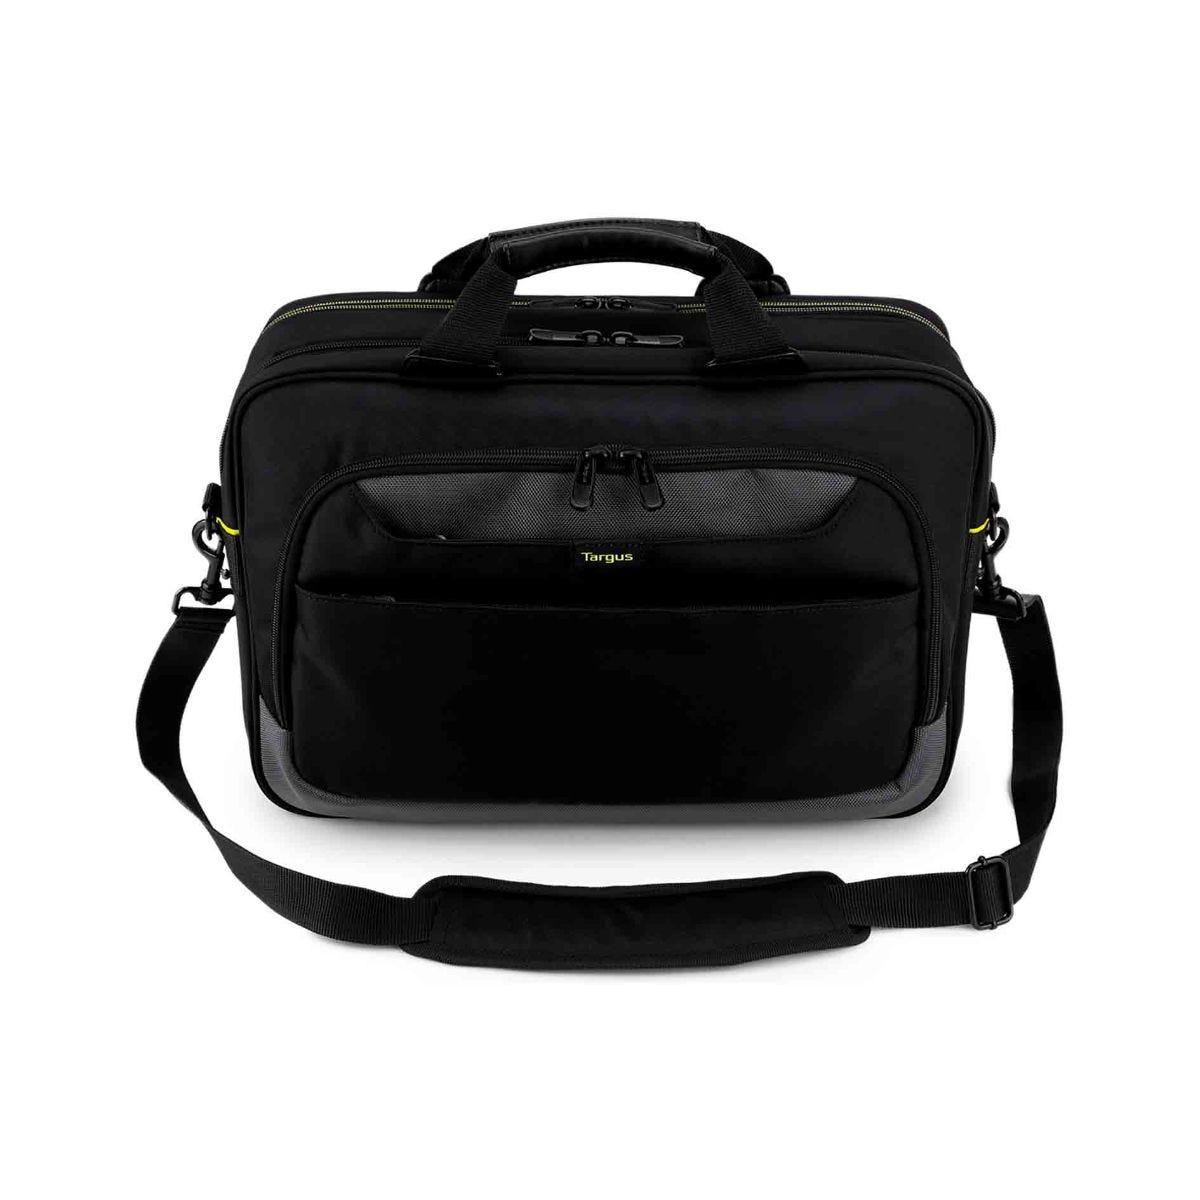 Image of Targus CityGear Topload Laptop Case 13 to 15.6 Inch Black, Black